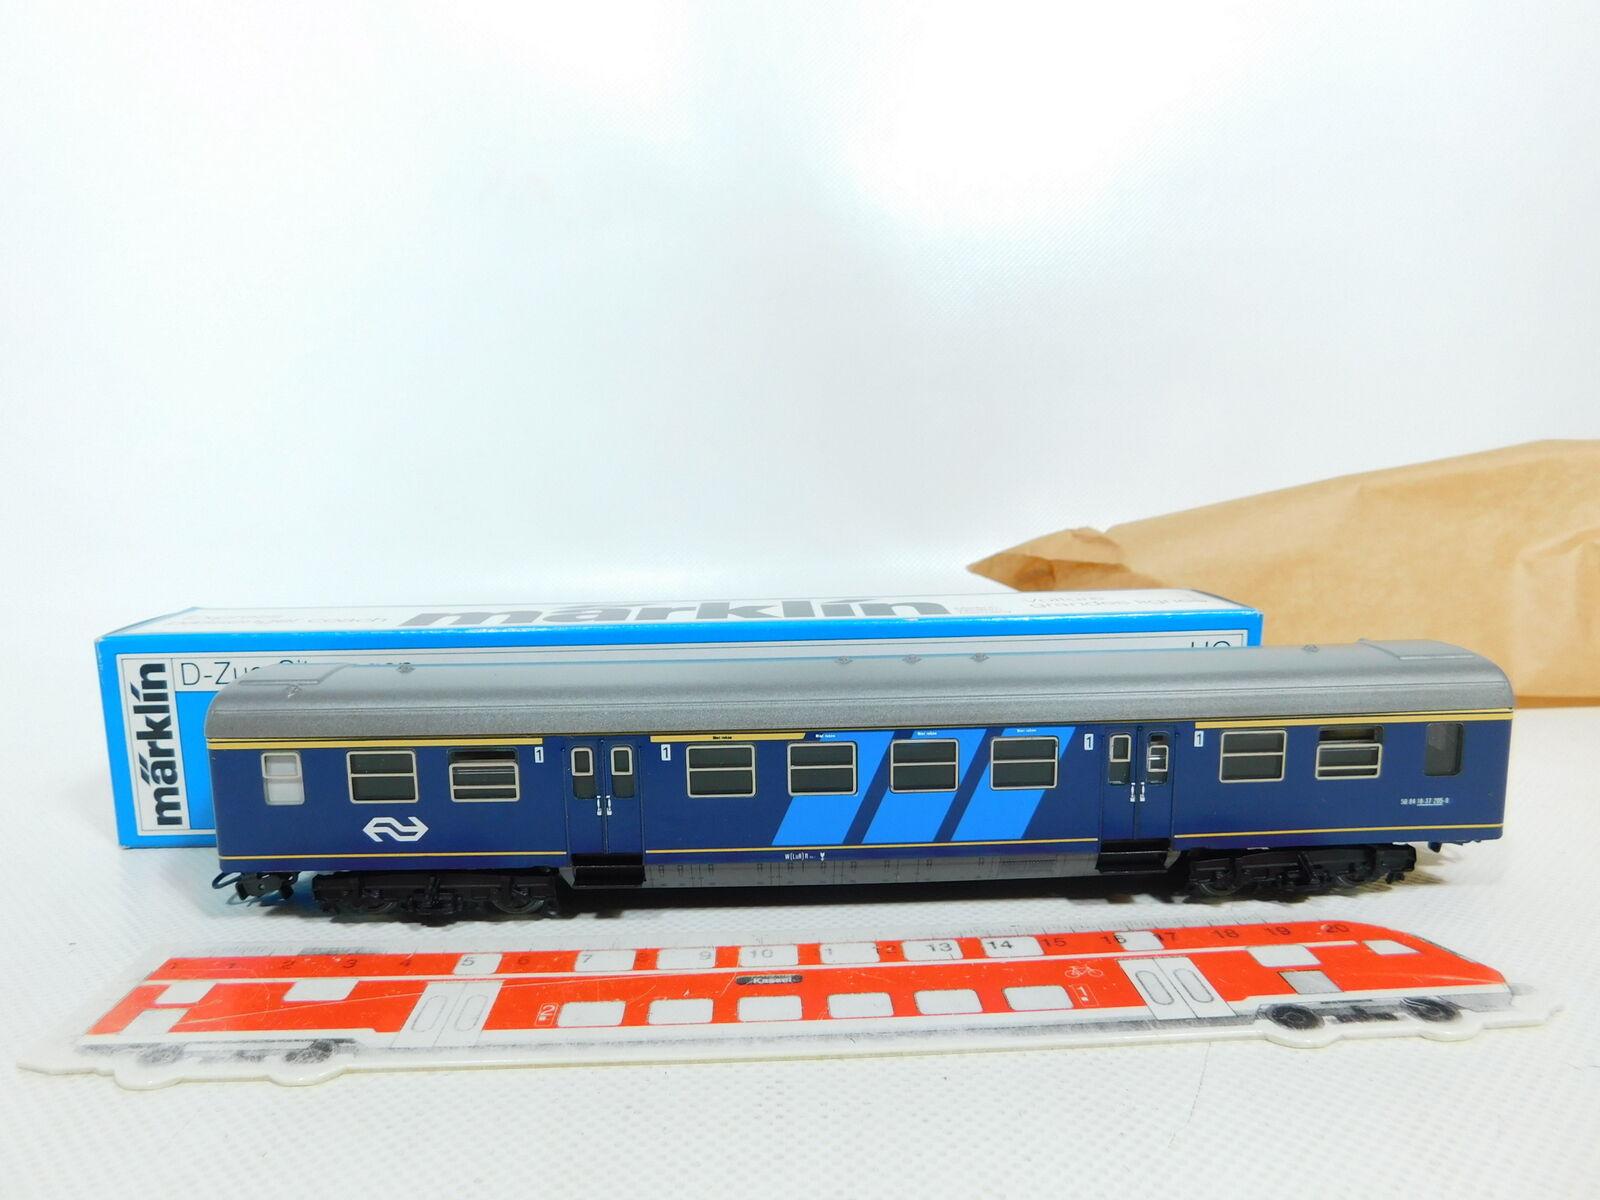 BV83-0,5 BV83-0,5 BV83-0,5 Märklin H0 Ac 4117 Foglio Metallo D Treno-Seggiolino NS ; Conf. Orig. aa07c1